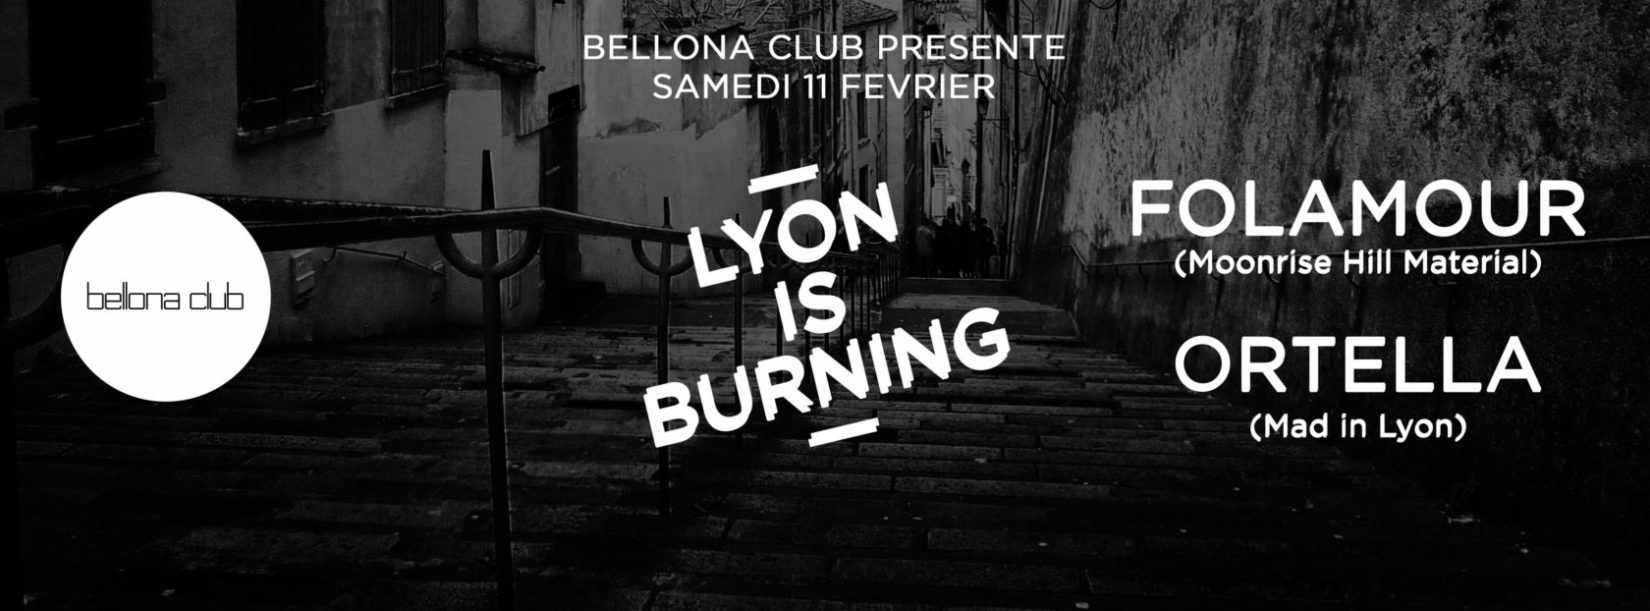 Lyon is burning #2 avec Folamour & Ortella